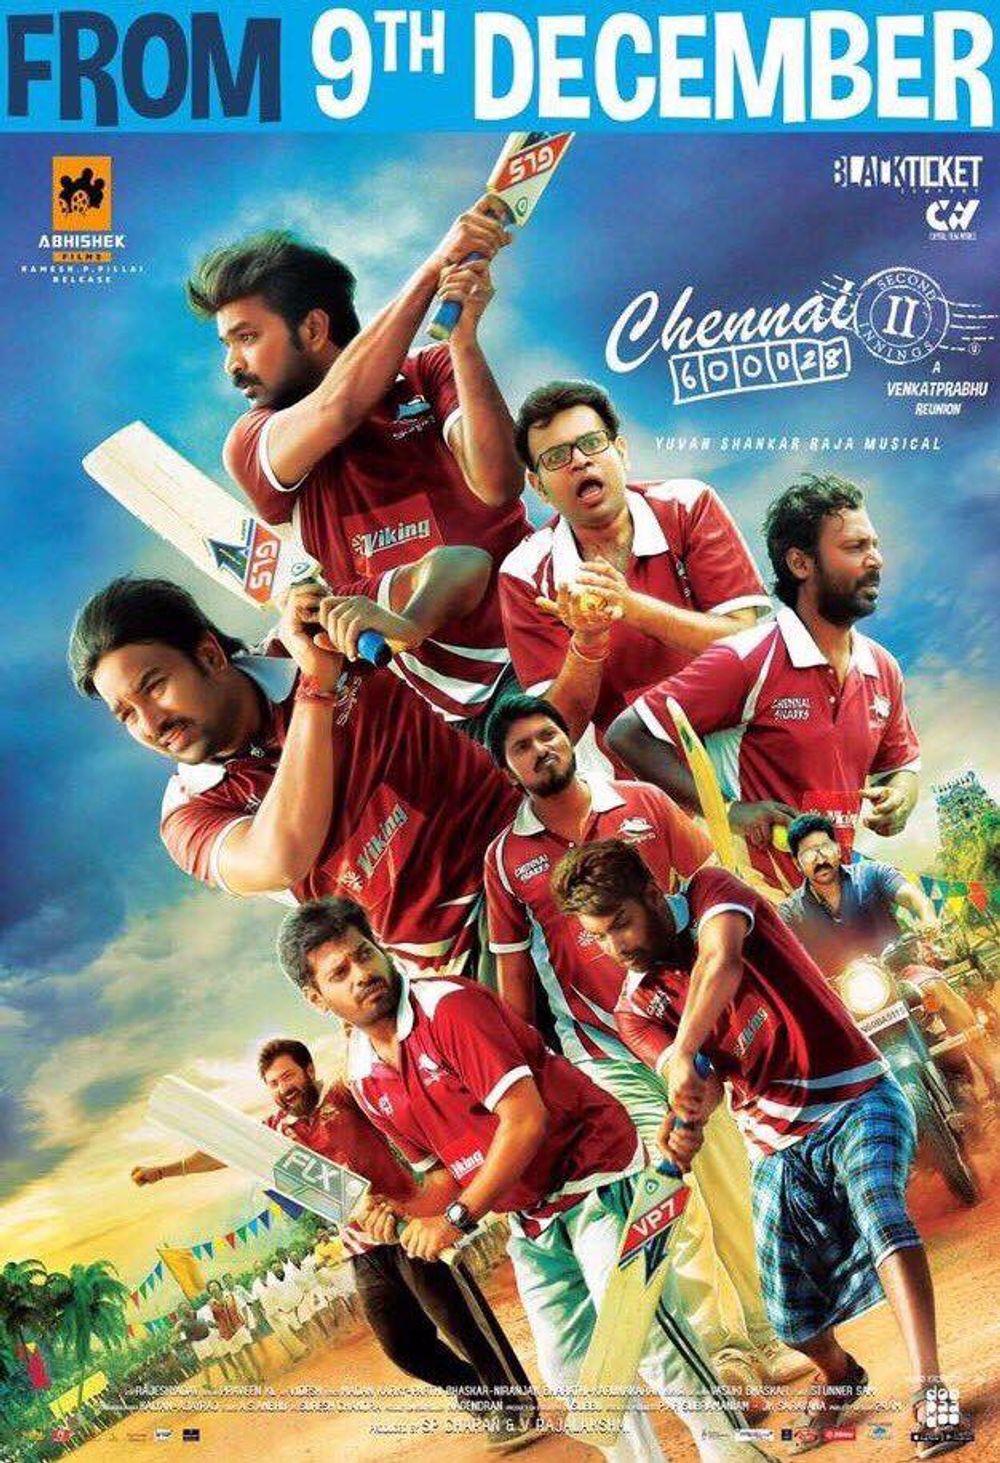 Chennai 600028 II 2021 Hindi Dubbed 382MB HDTVRip Download